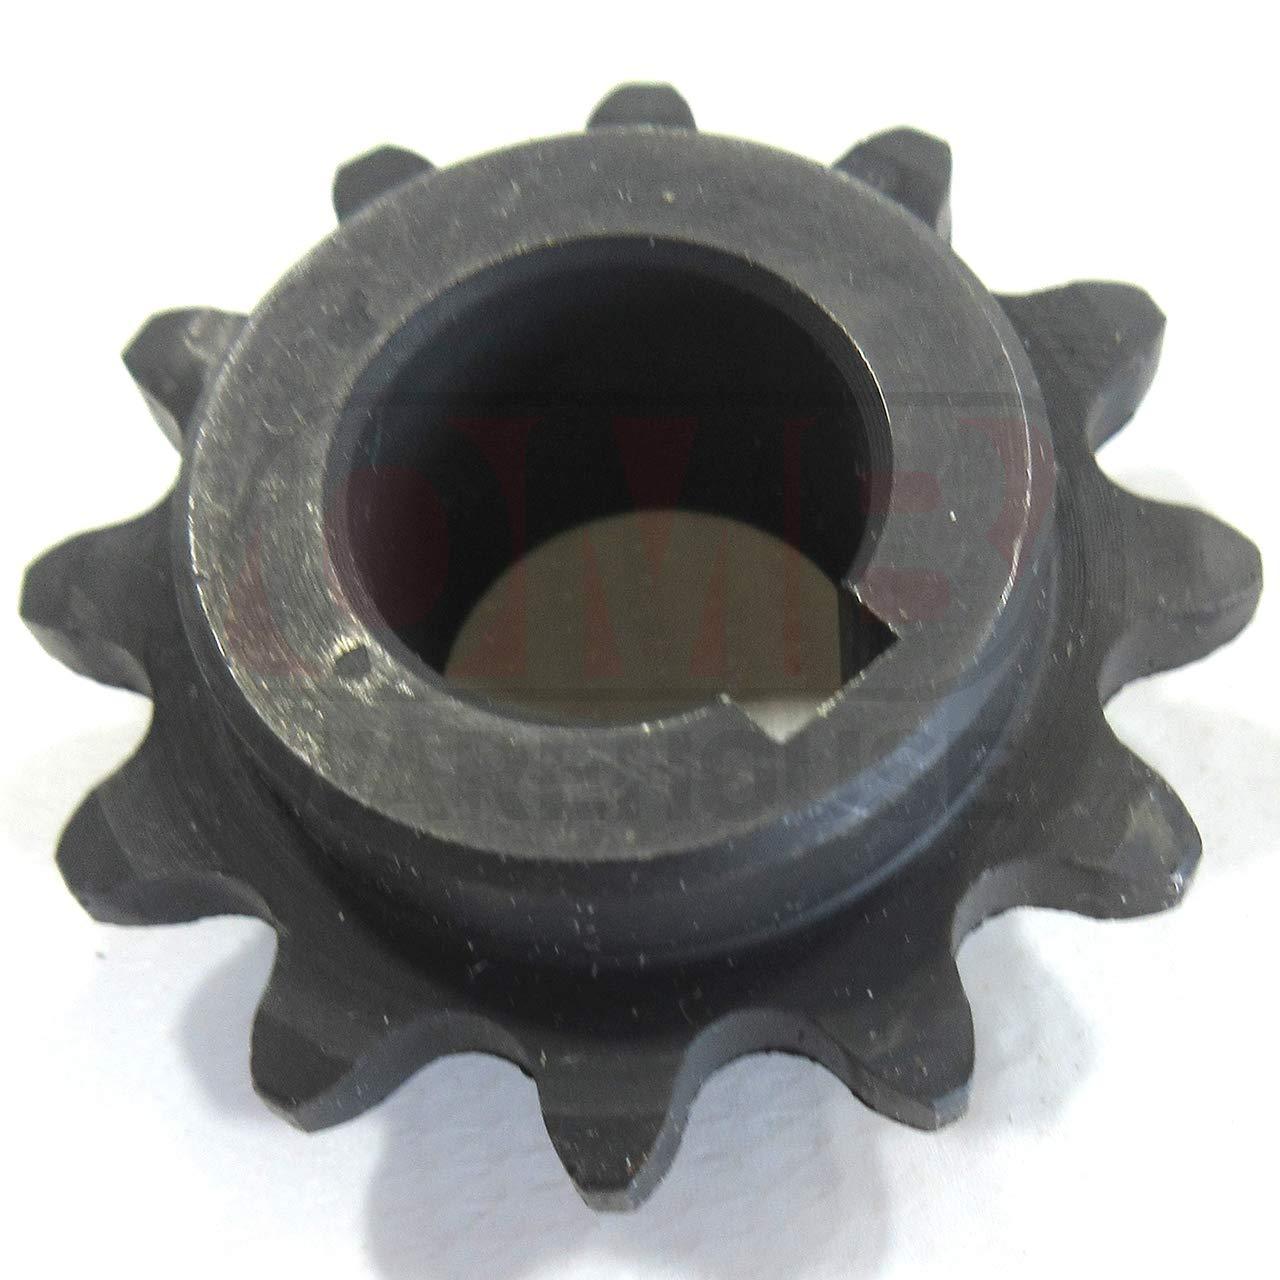 Azusa 12 Tooth 35 Chain 5/8'' Bore Torque Converter Sprocket